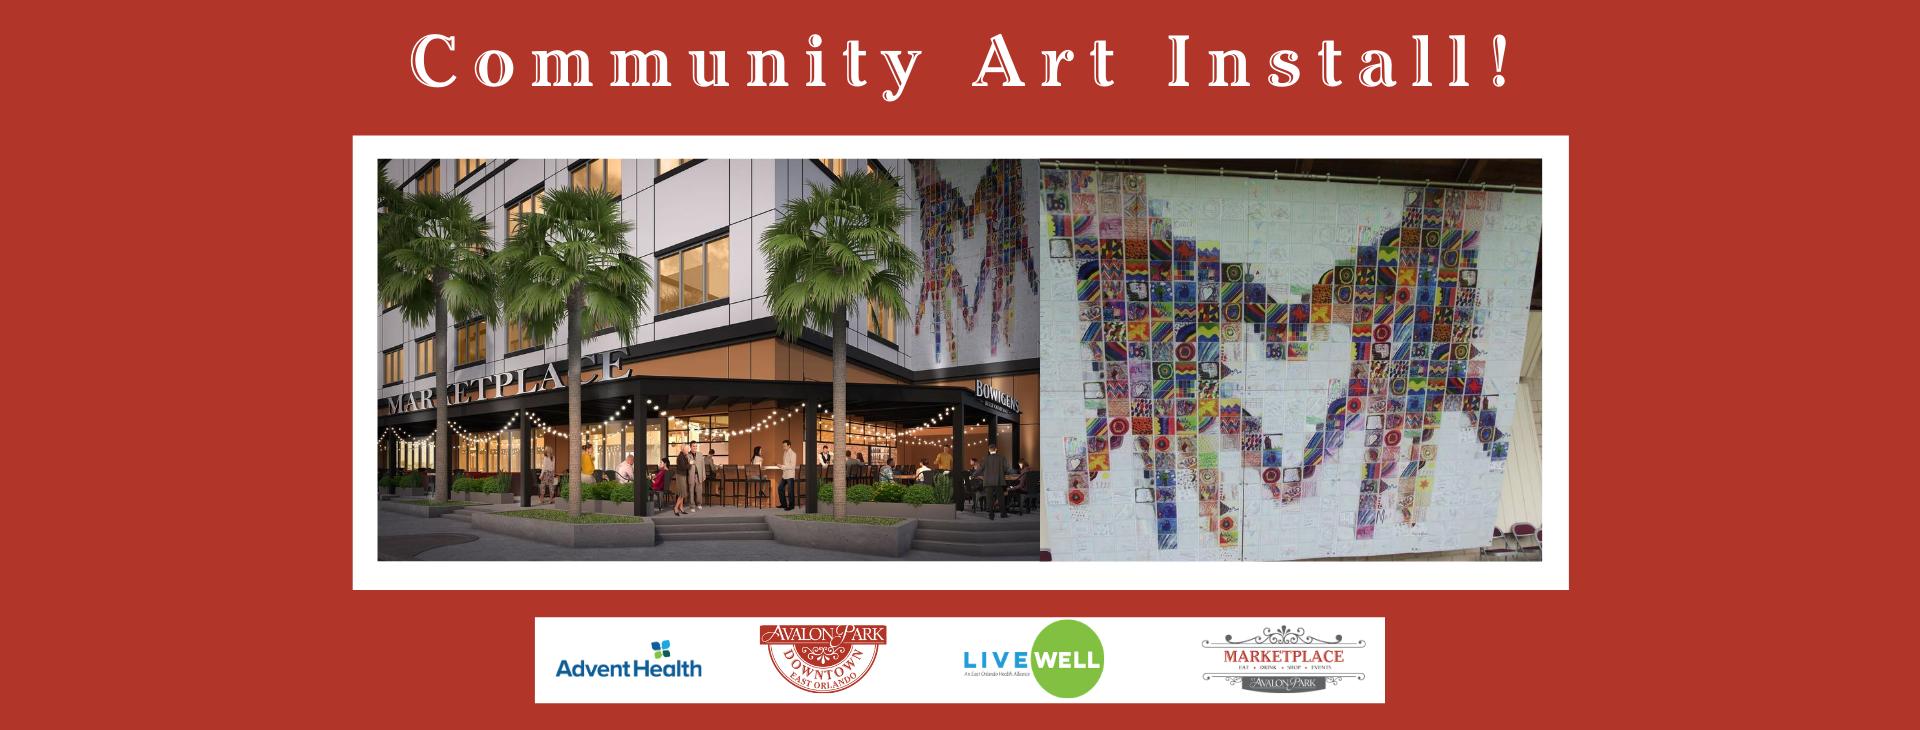 FB Cover Community Art Install